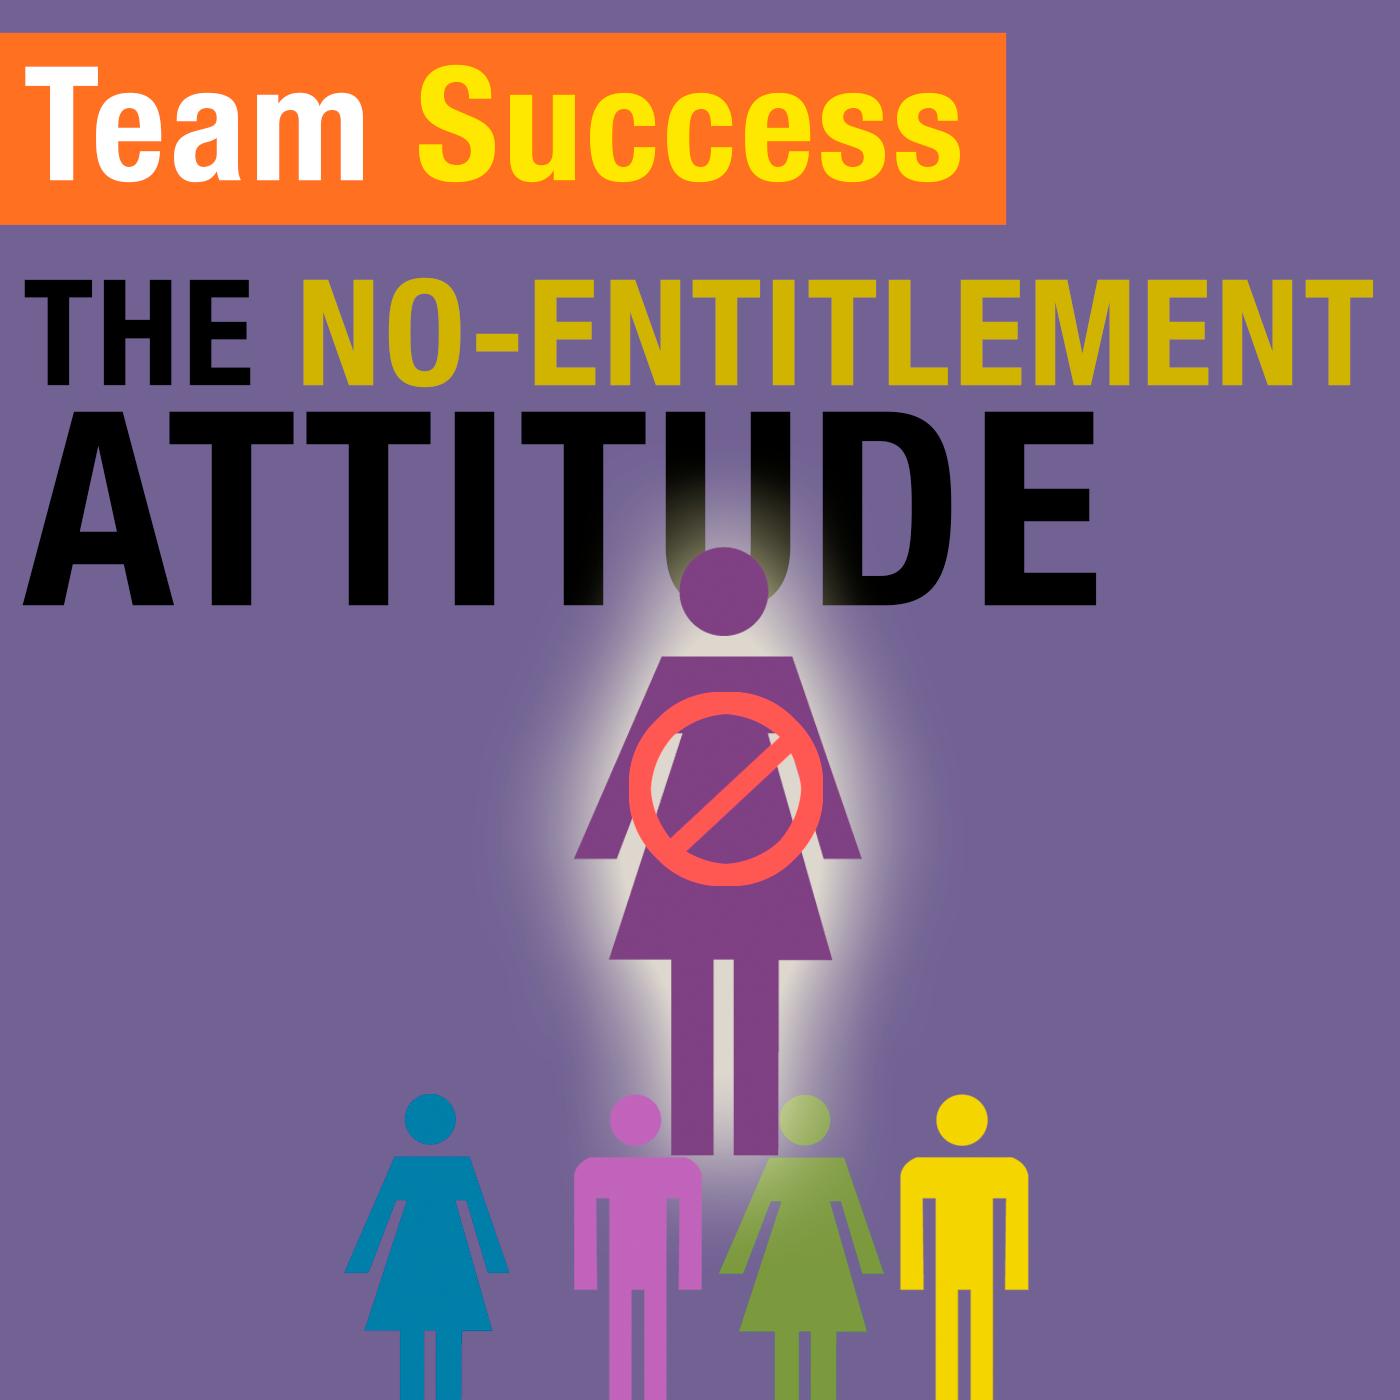 The No-Entitlement Attitude - Team Success Podcast